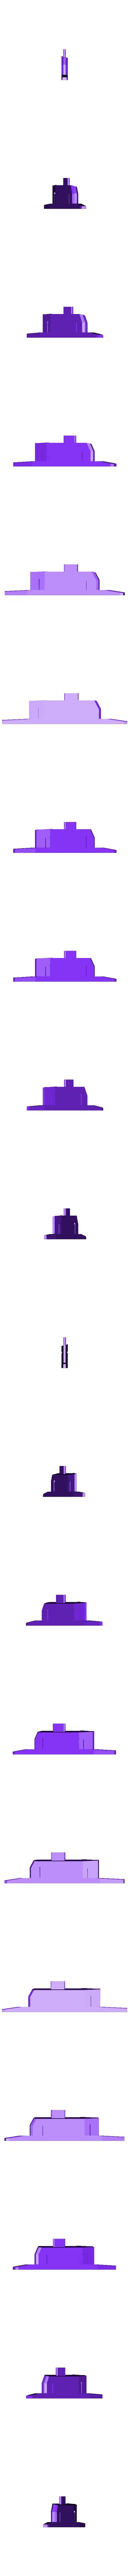 26 - PYLON 5.stl Download STL file DOUGLAS F4D SKYRAY  • 3D printer object, 3DprintedArmy